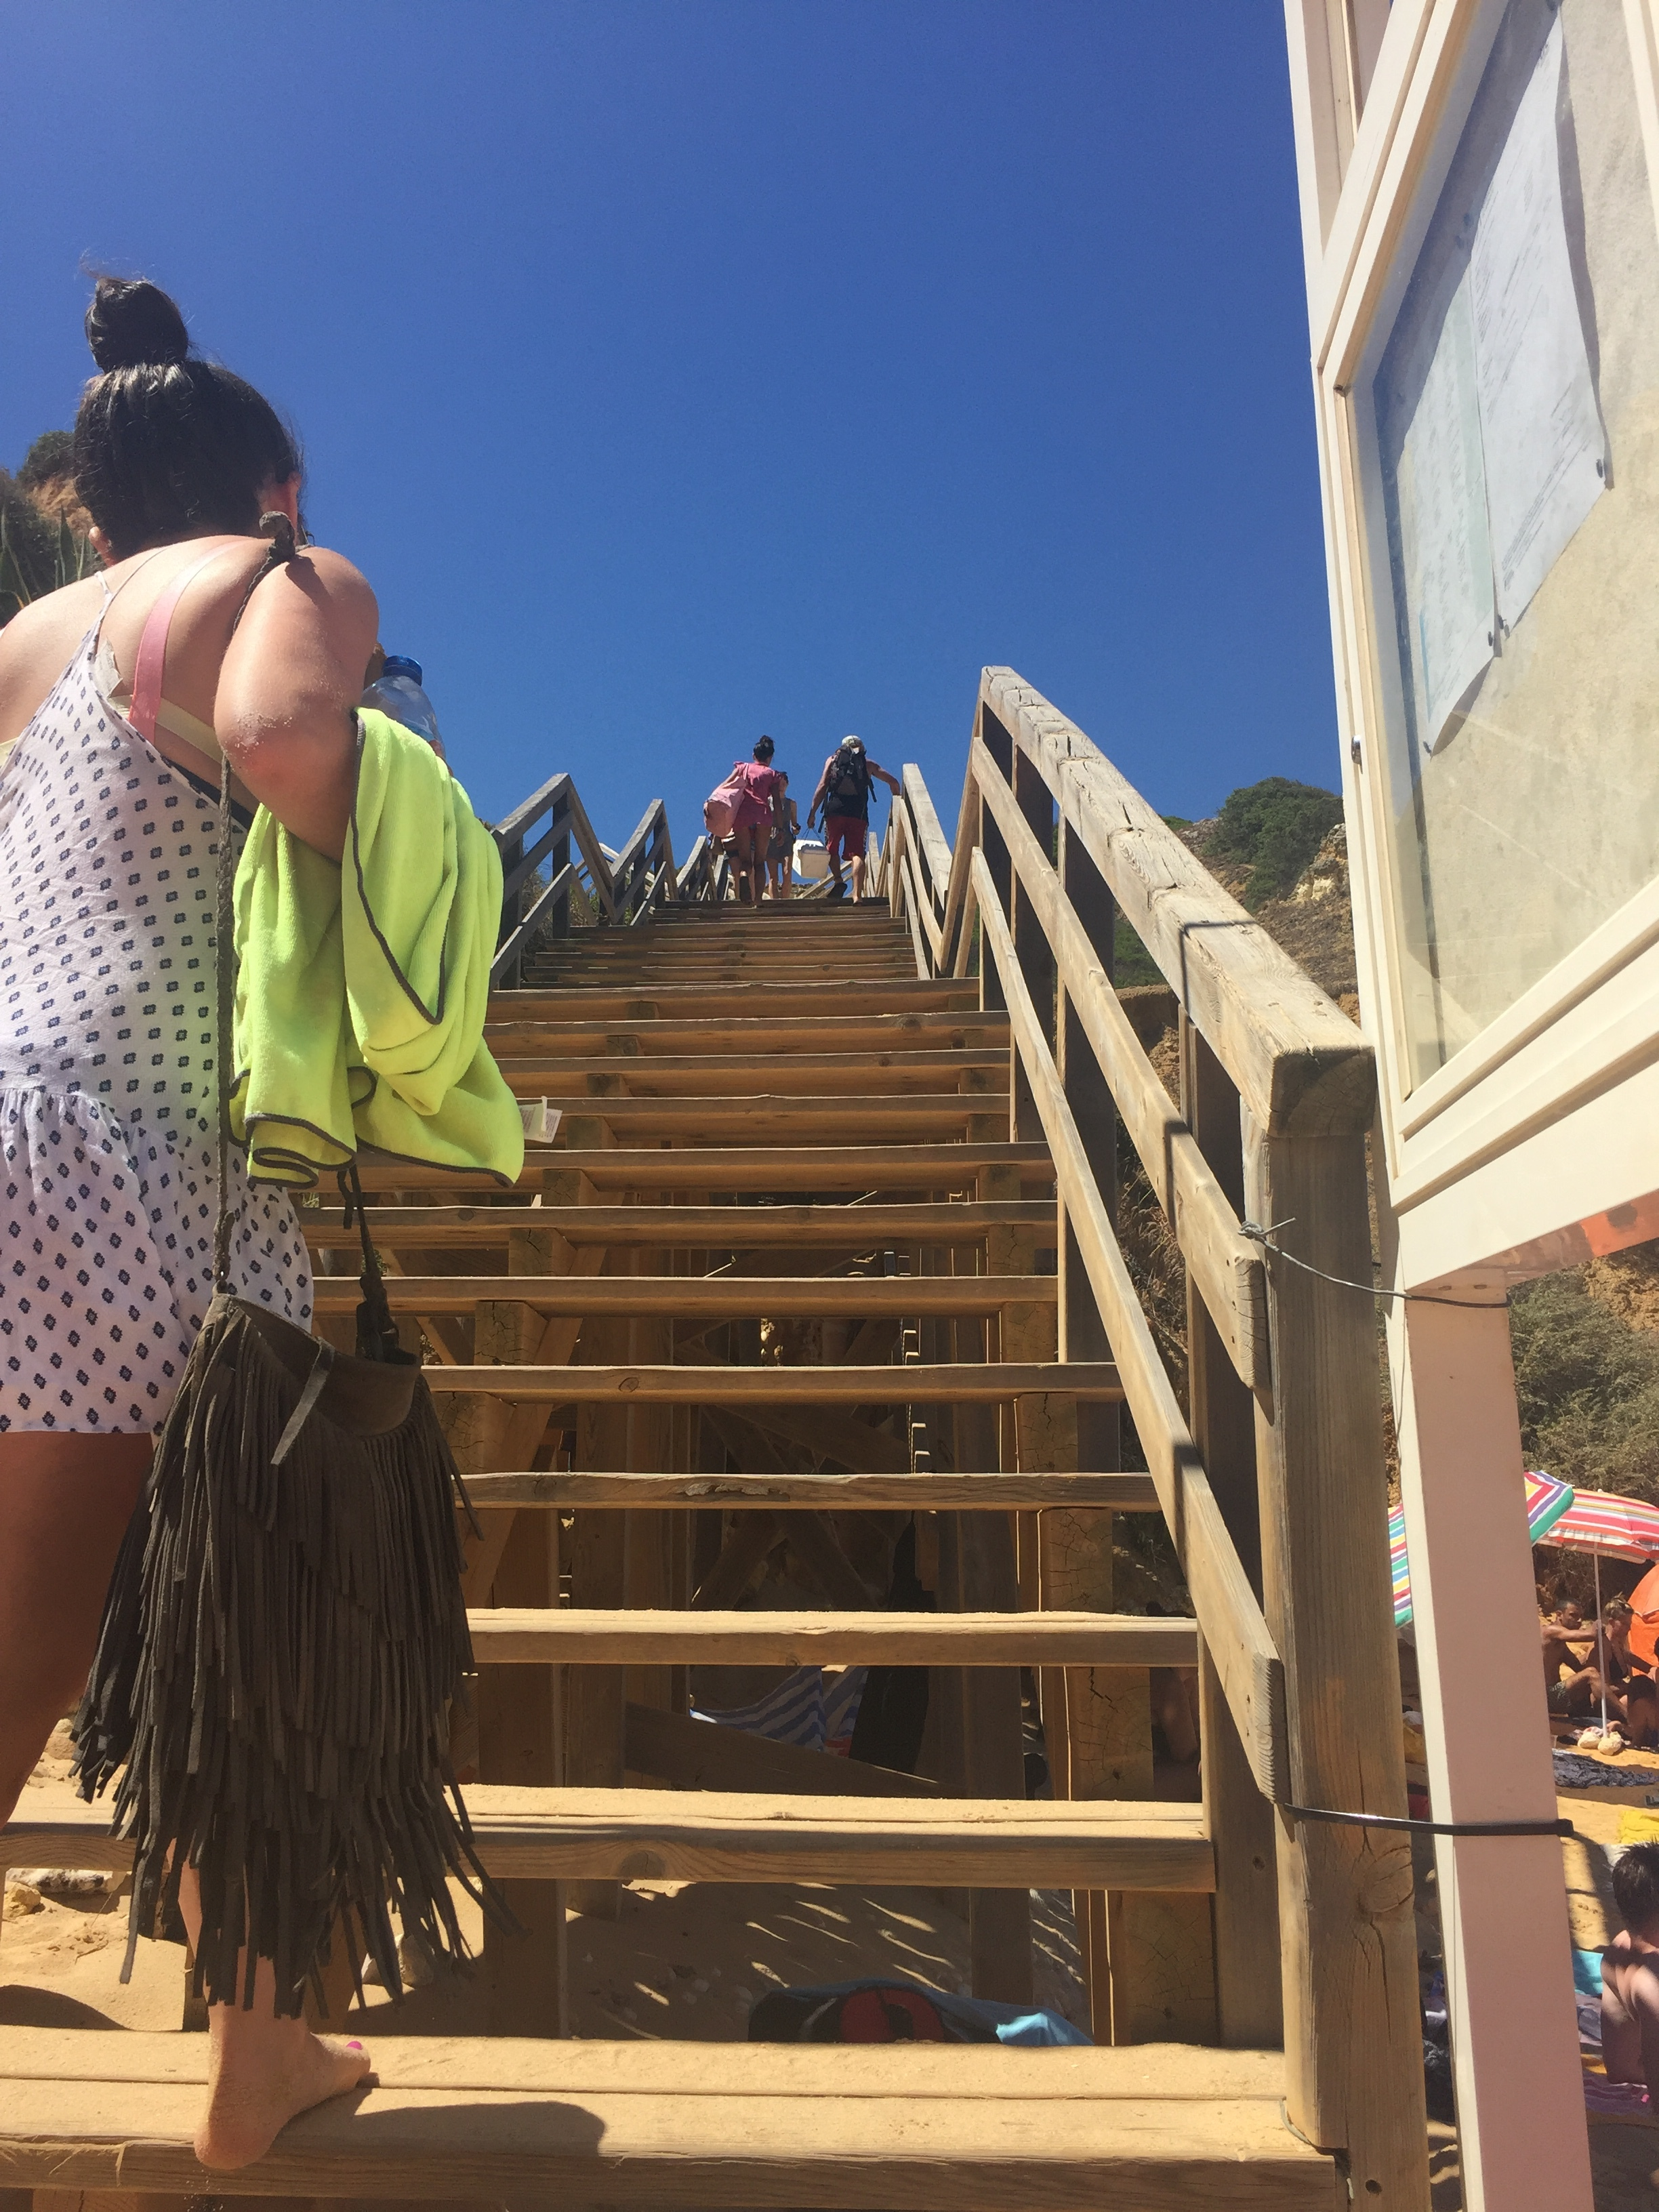 Stairs. Everywhere.